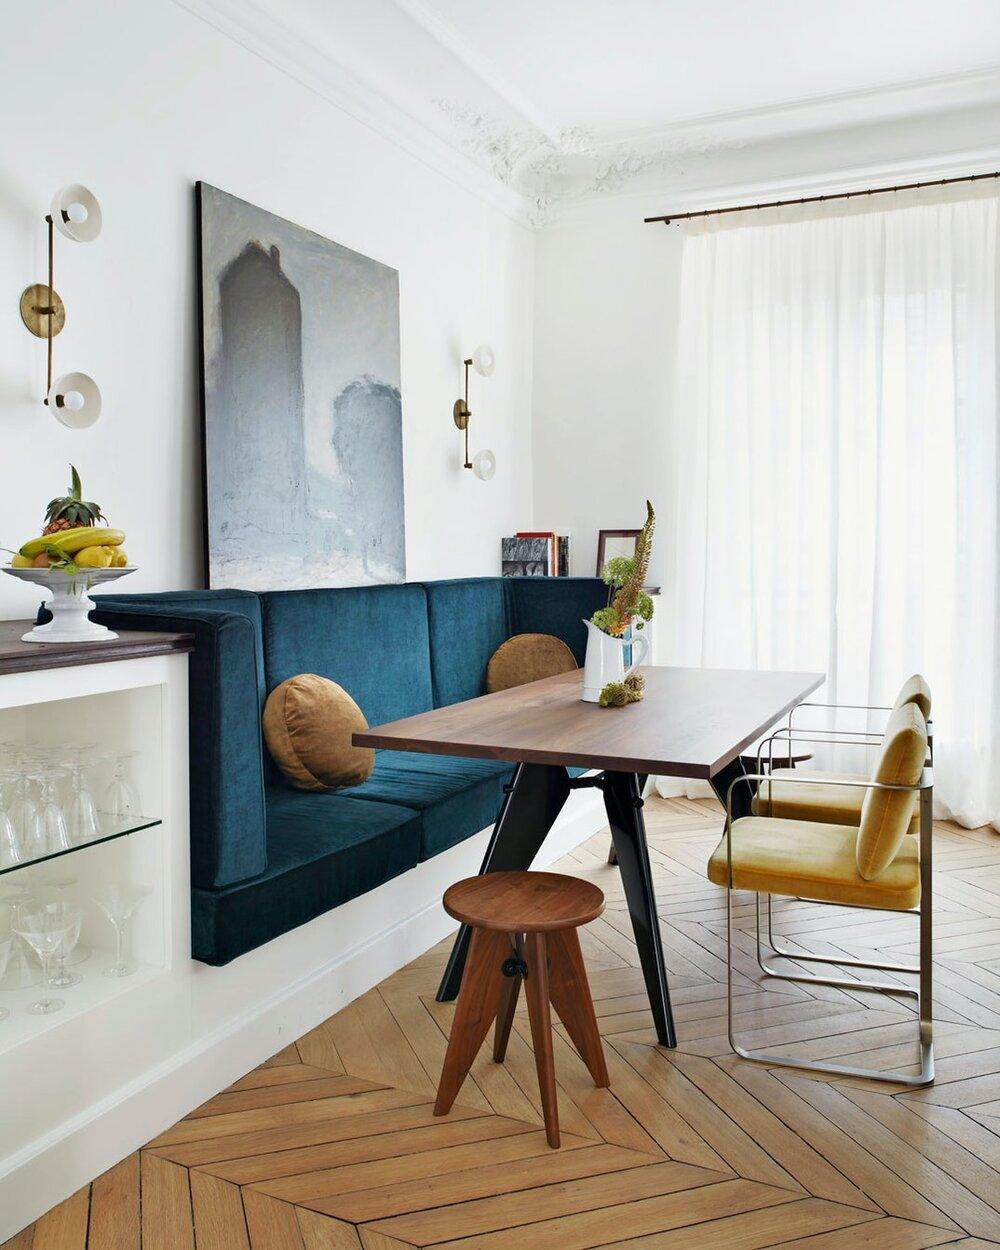 Modern And Classic Design in a 19th-Century Paris Apartment